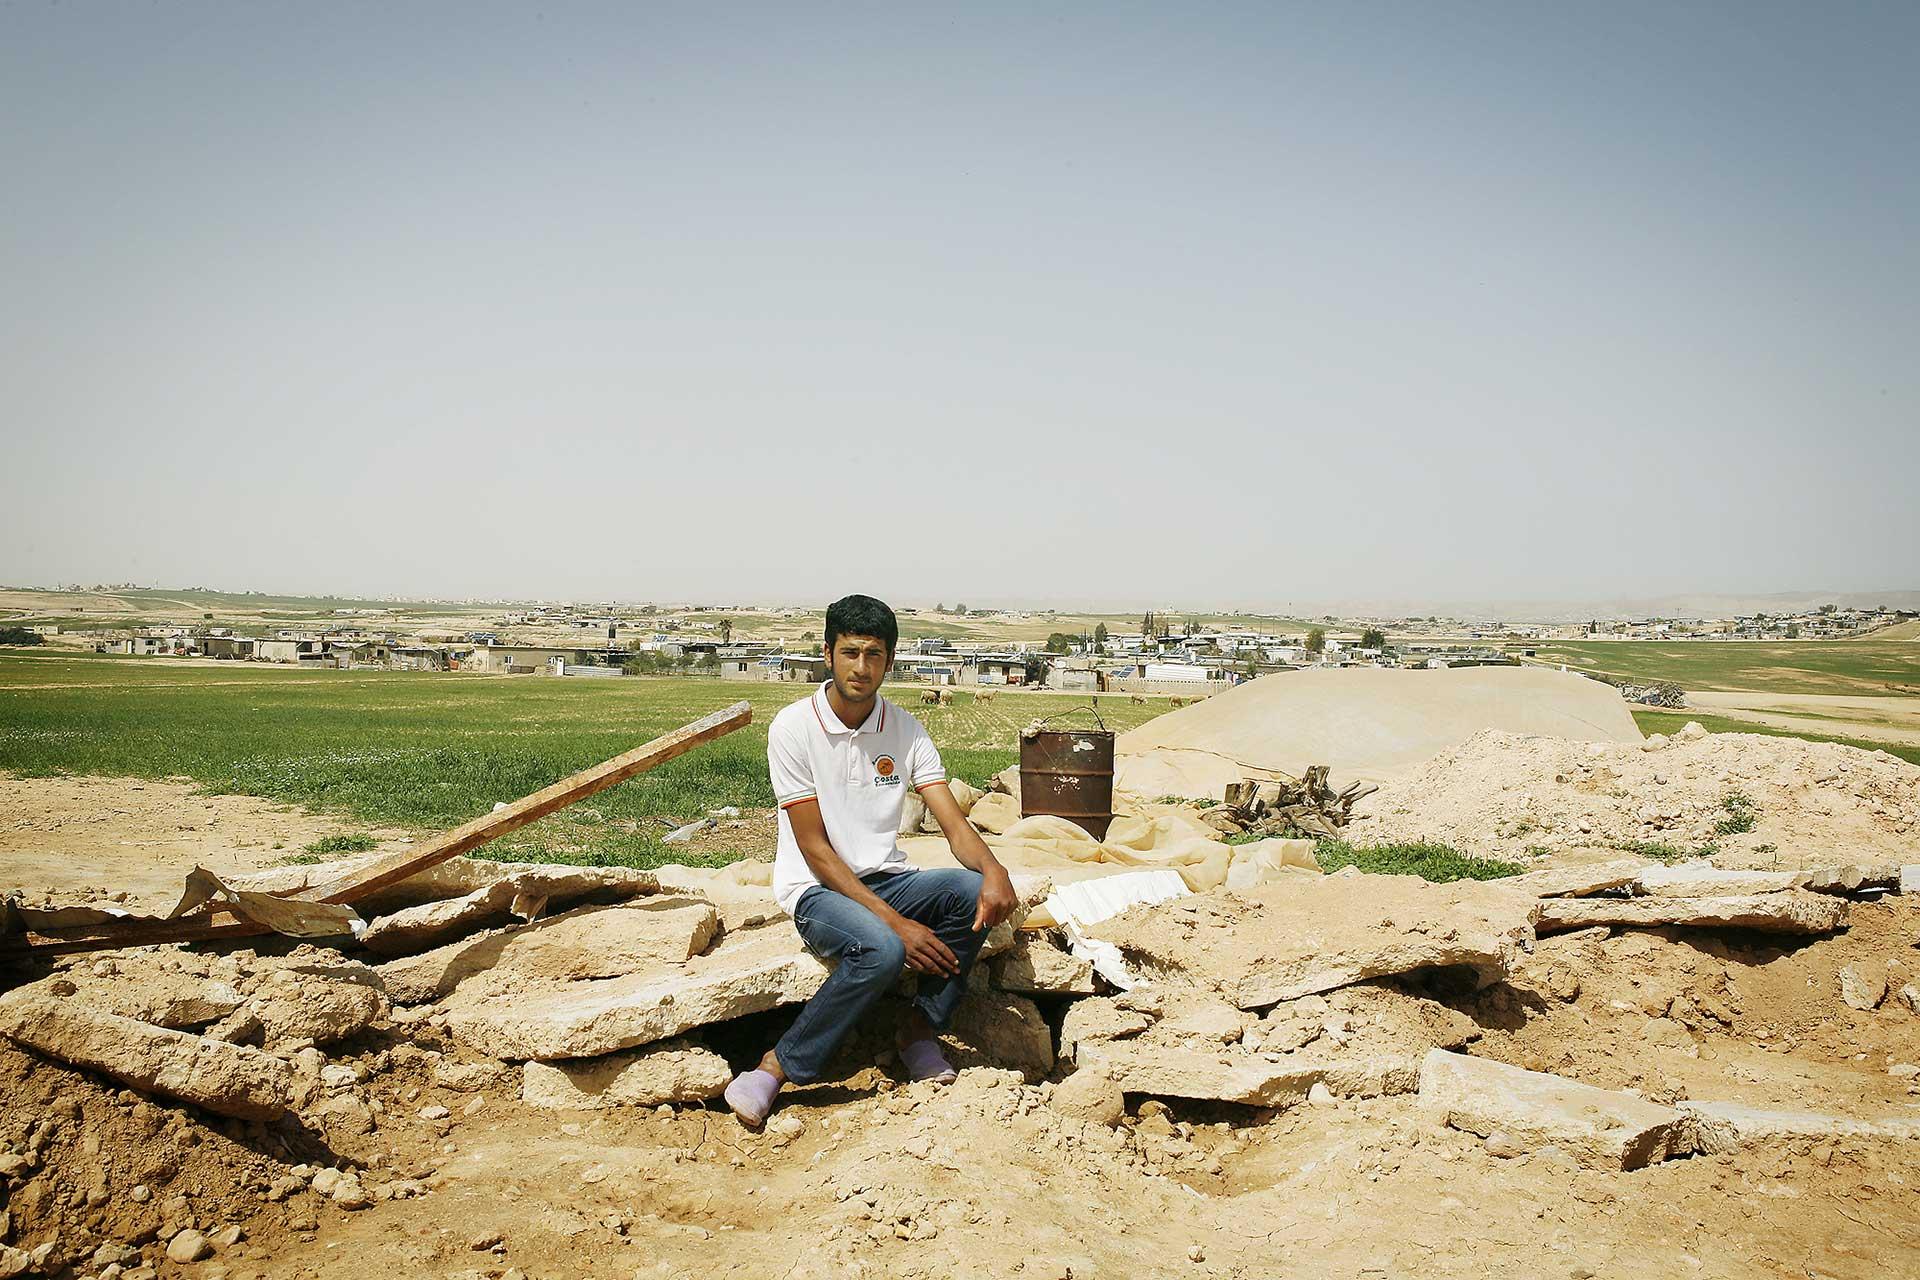 Unrecognized village of Al Zaroura, Israel 2014